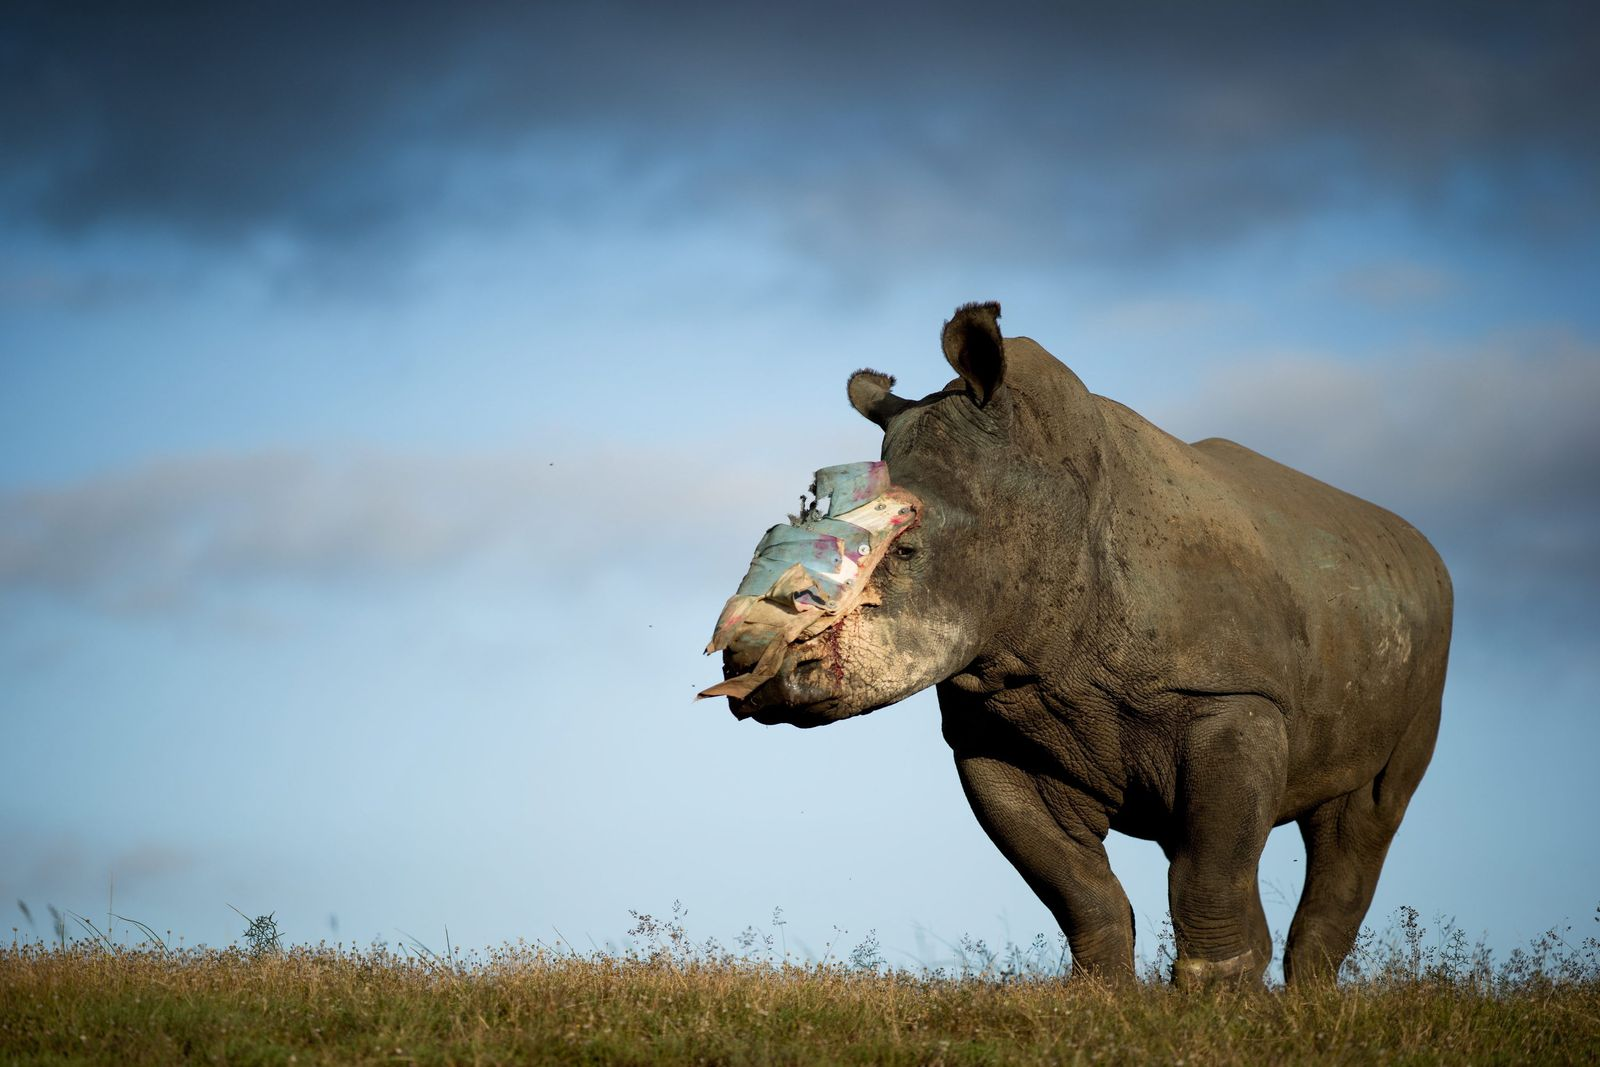 Hope the rehabilitated Rhino